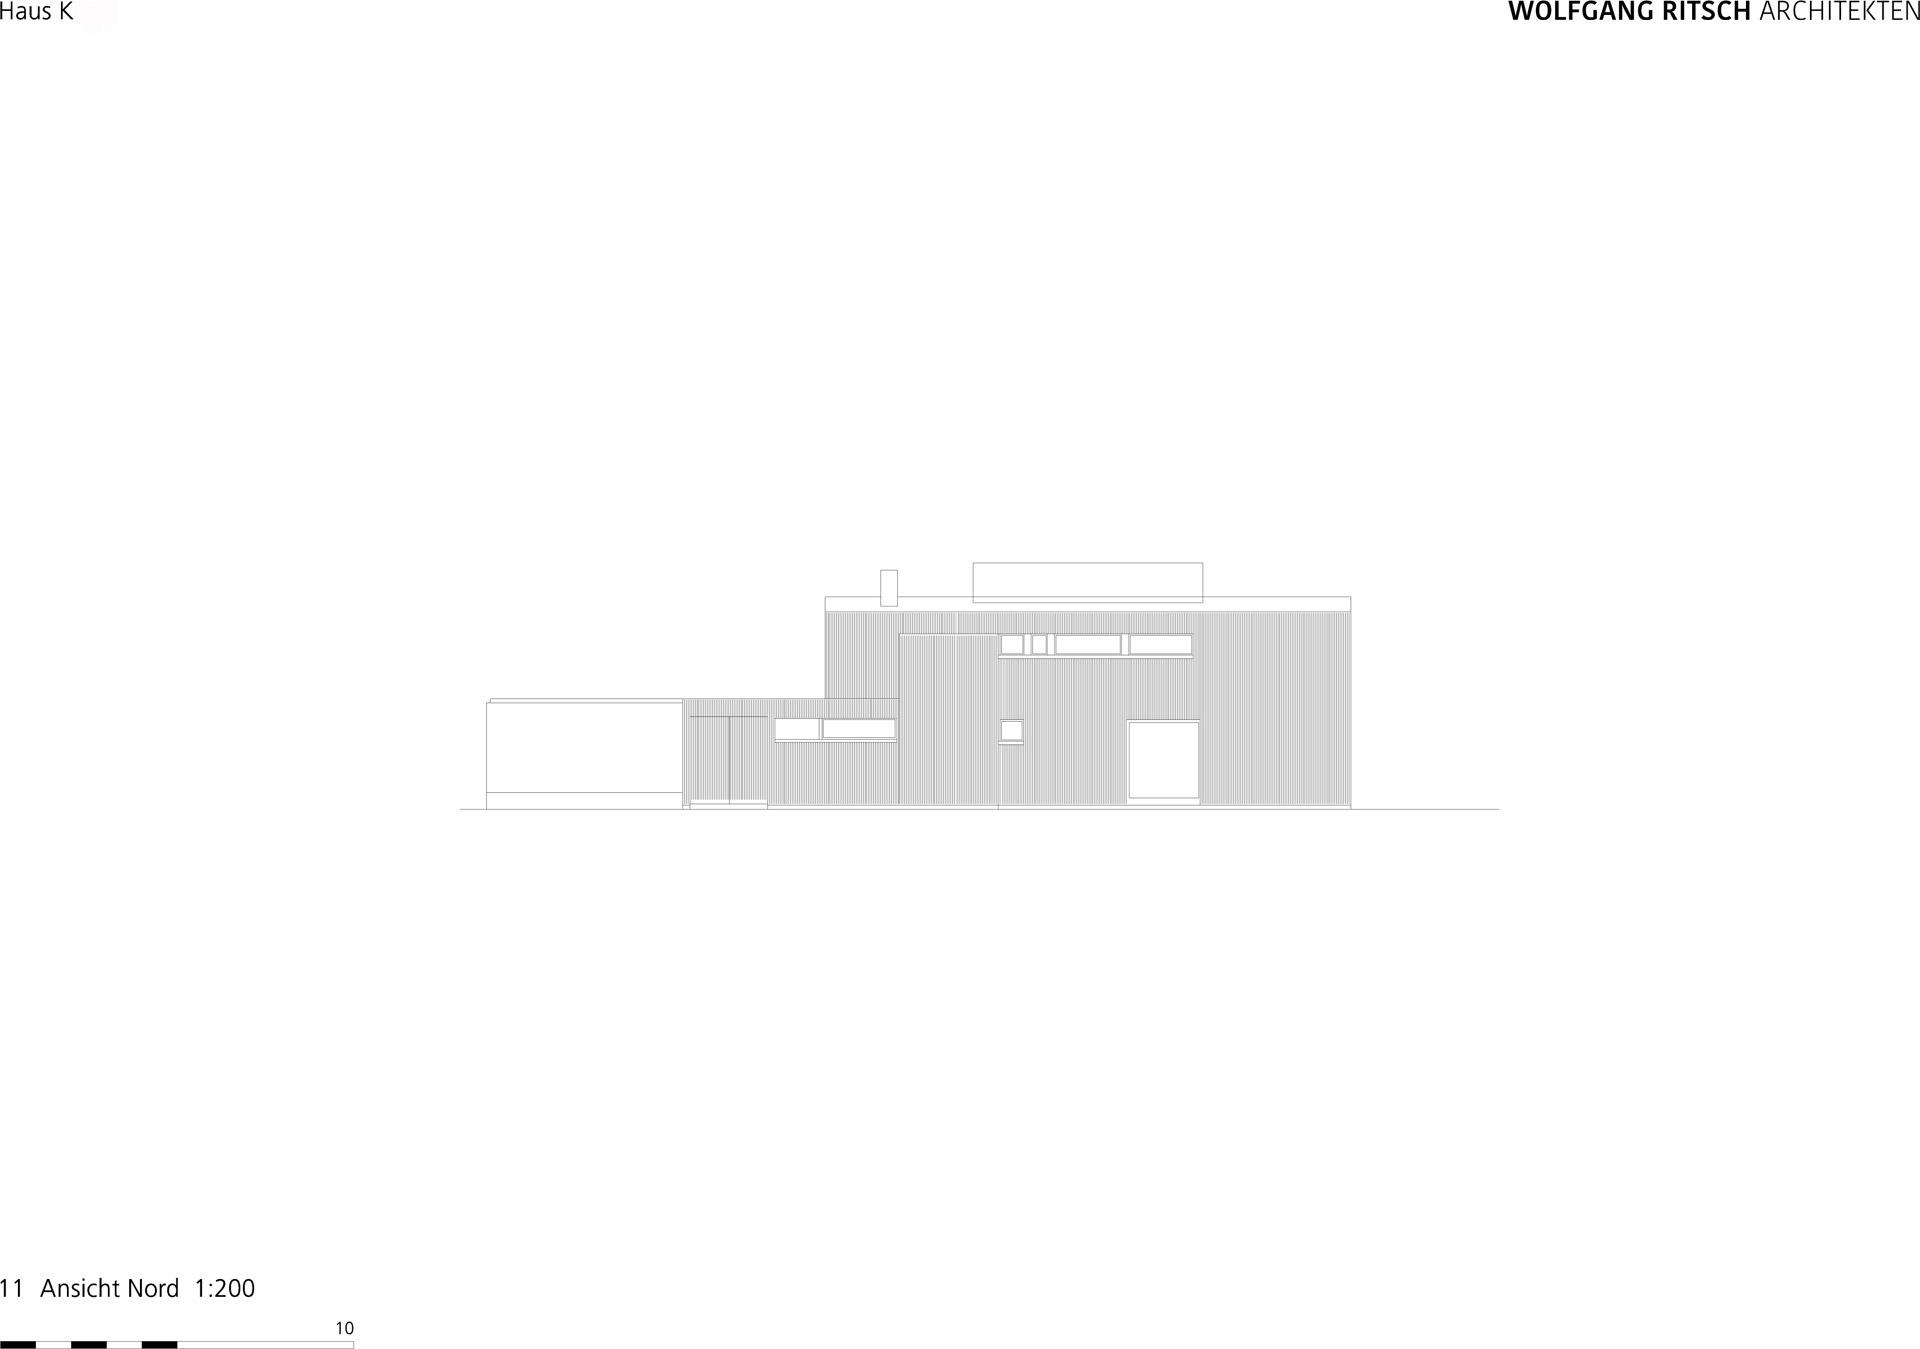 X:PROJEKTE7000ý0 Kopf Manfred Sulz2-PUBLIPLAN20-dwg911_Ans